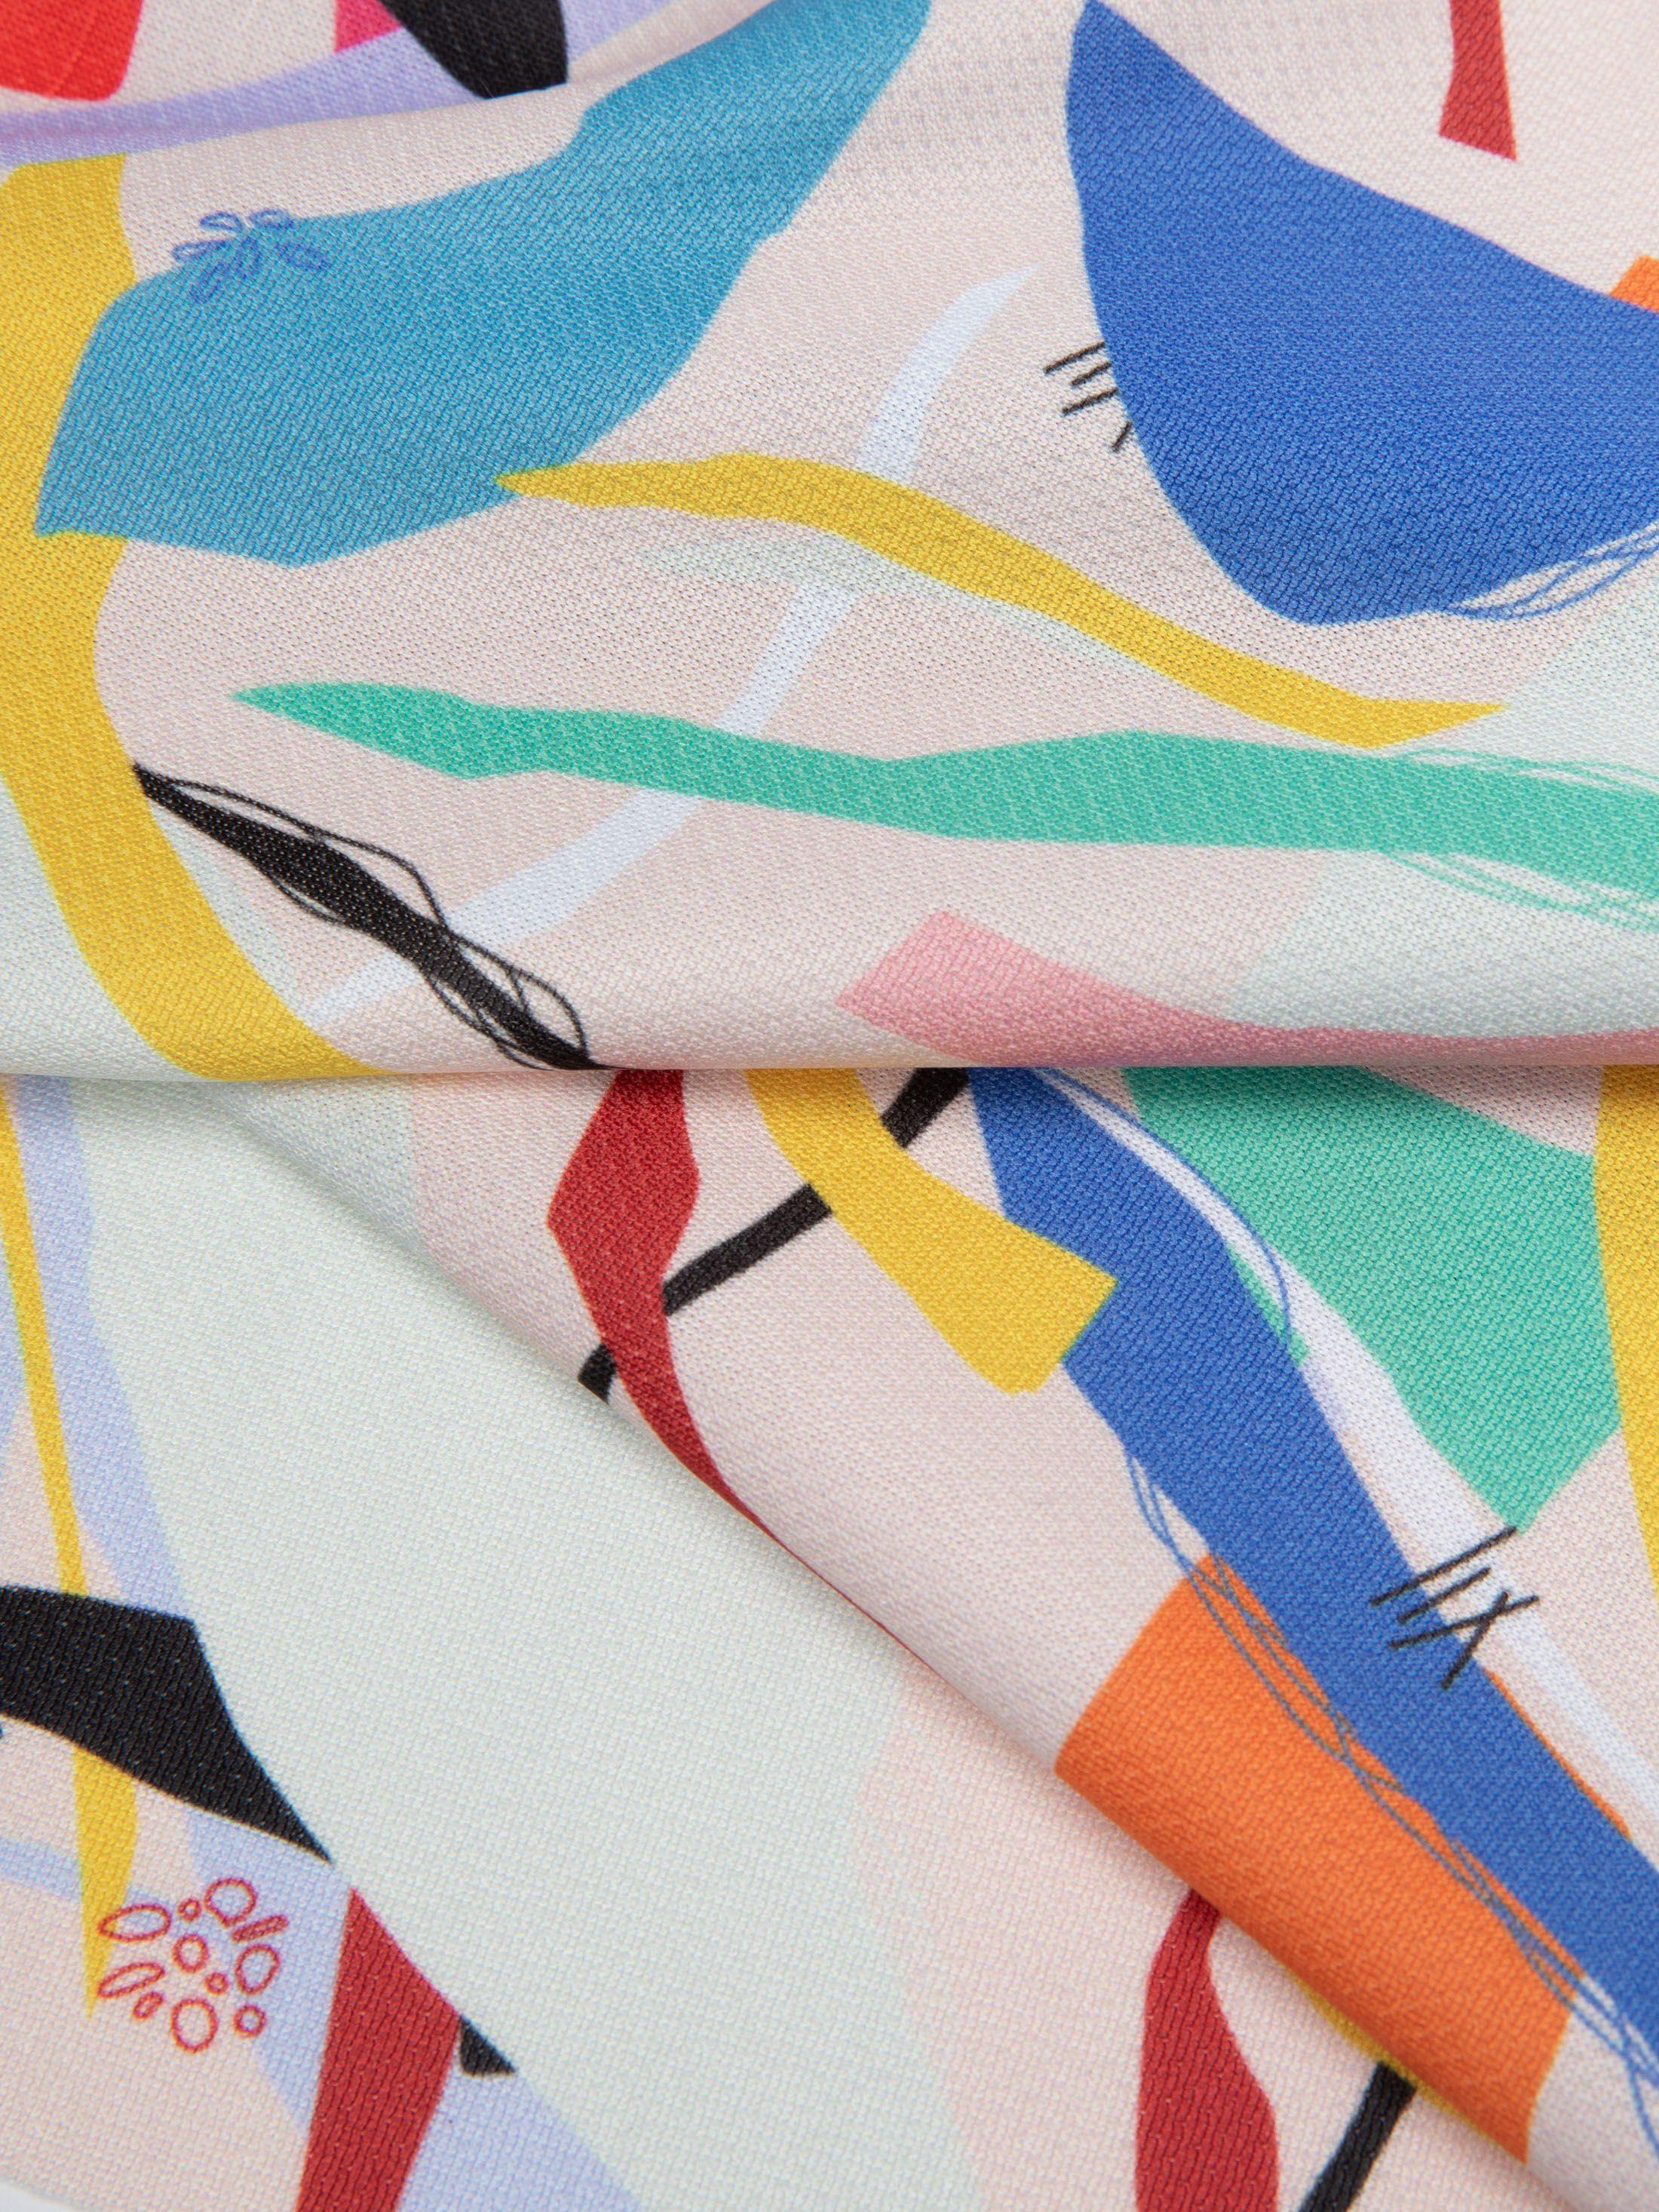 personalised sportswear fabric UK